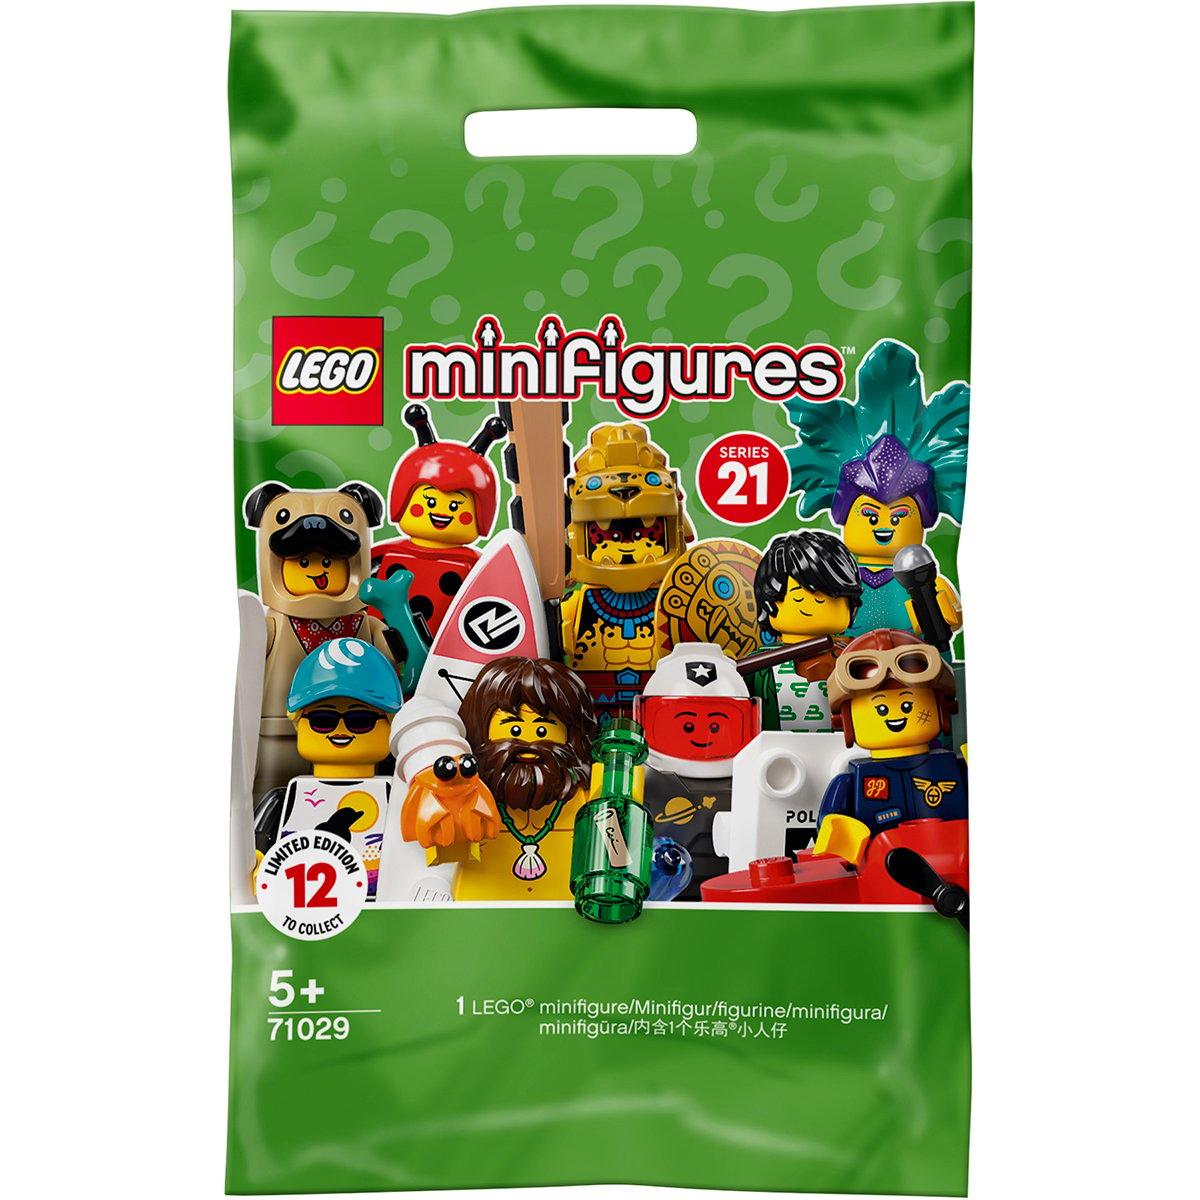 Figurina surpriza LEGO® Minifigures - Seria 21 (71029)